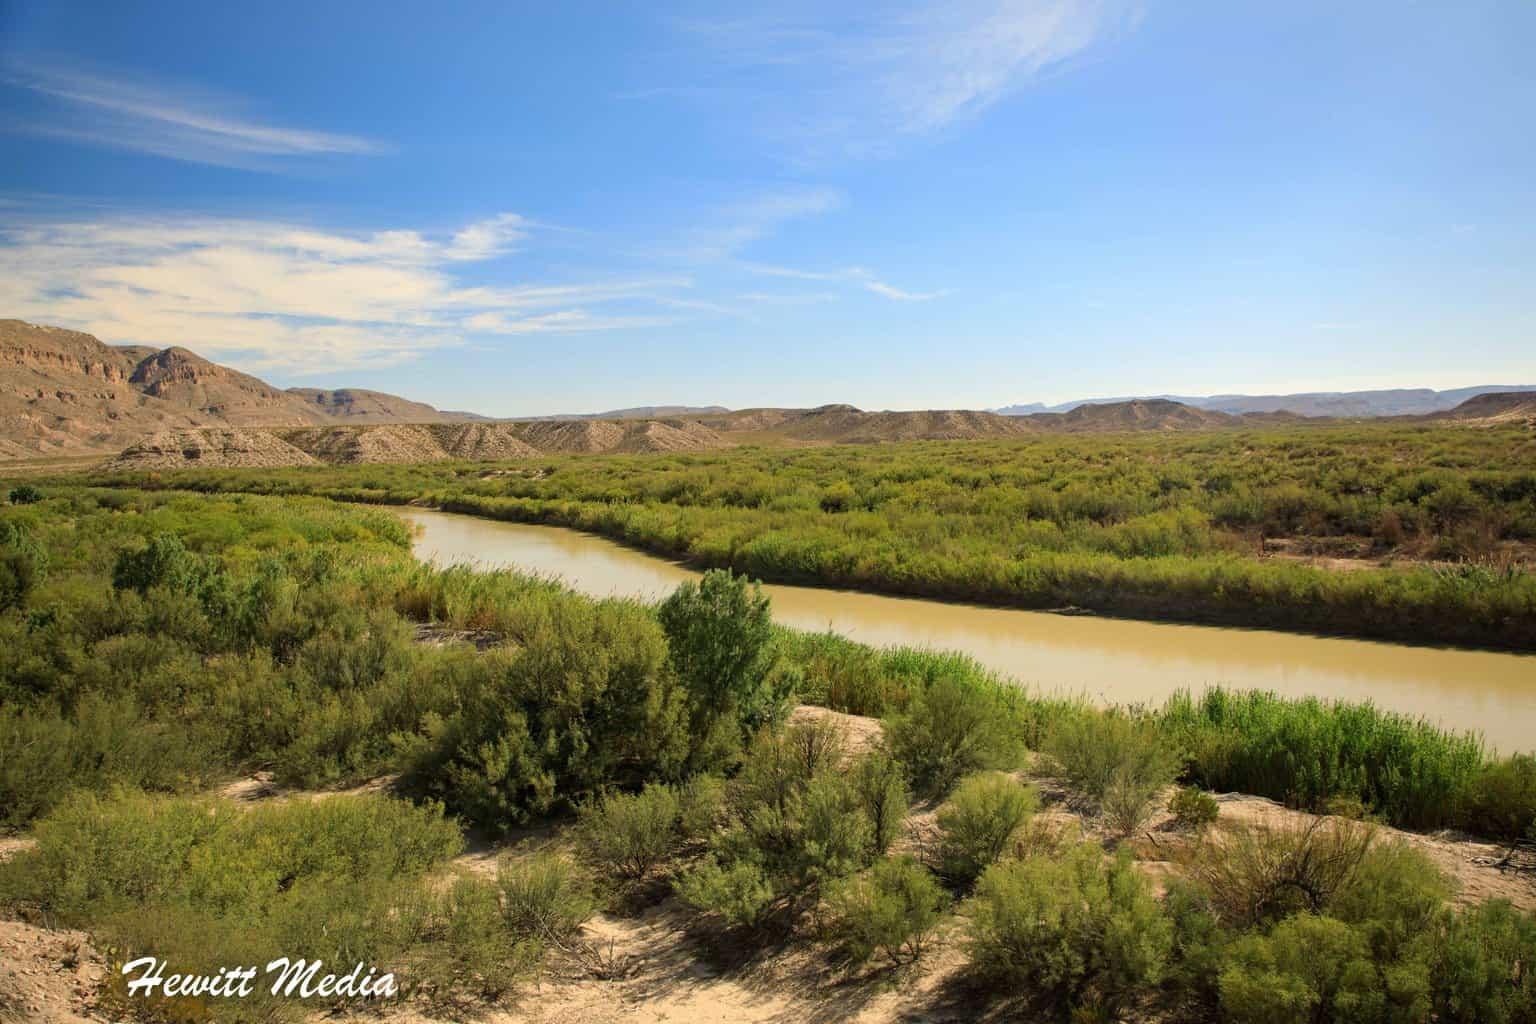 The Rio Grande River inside Big Bend National Park